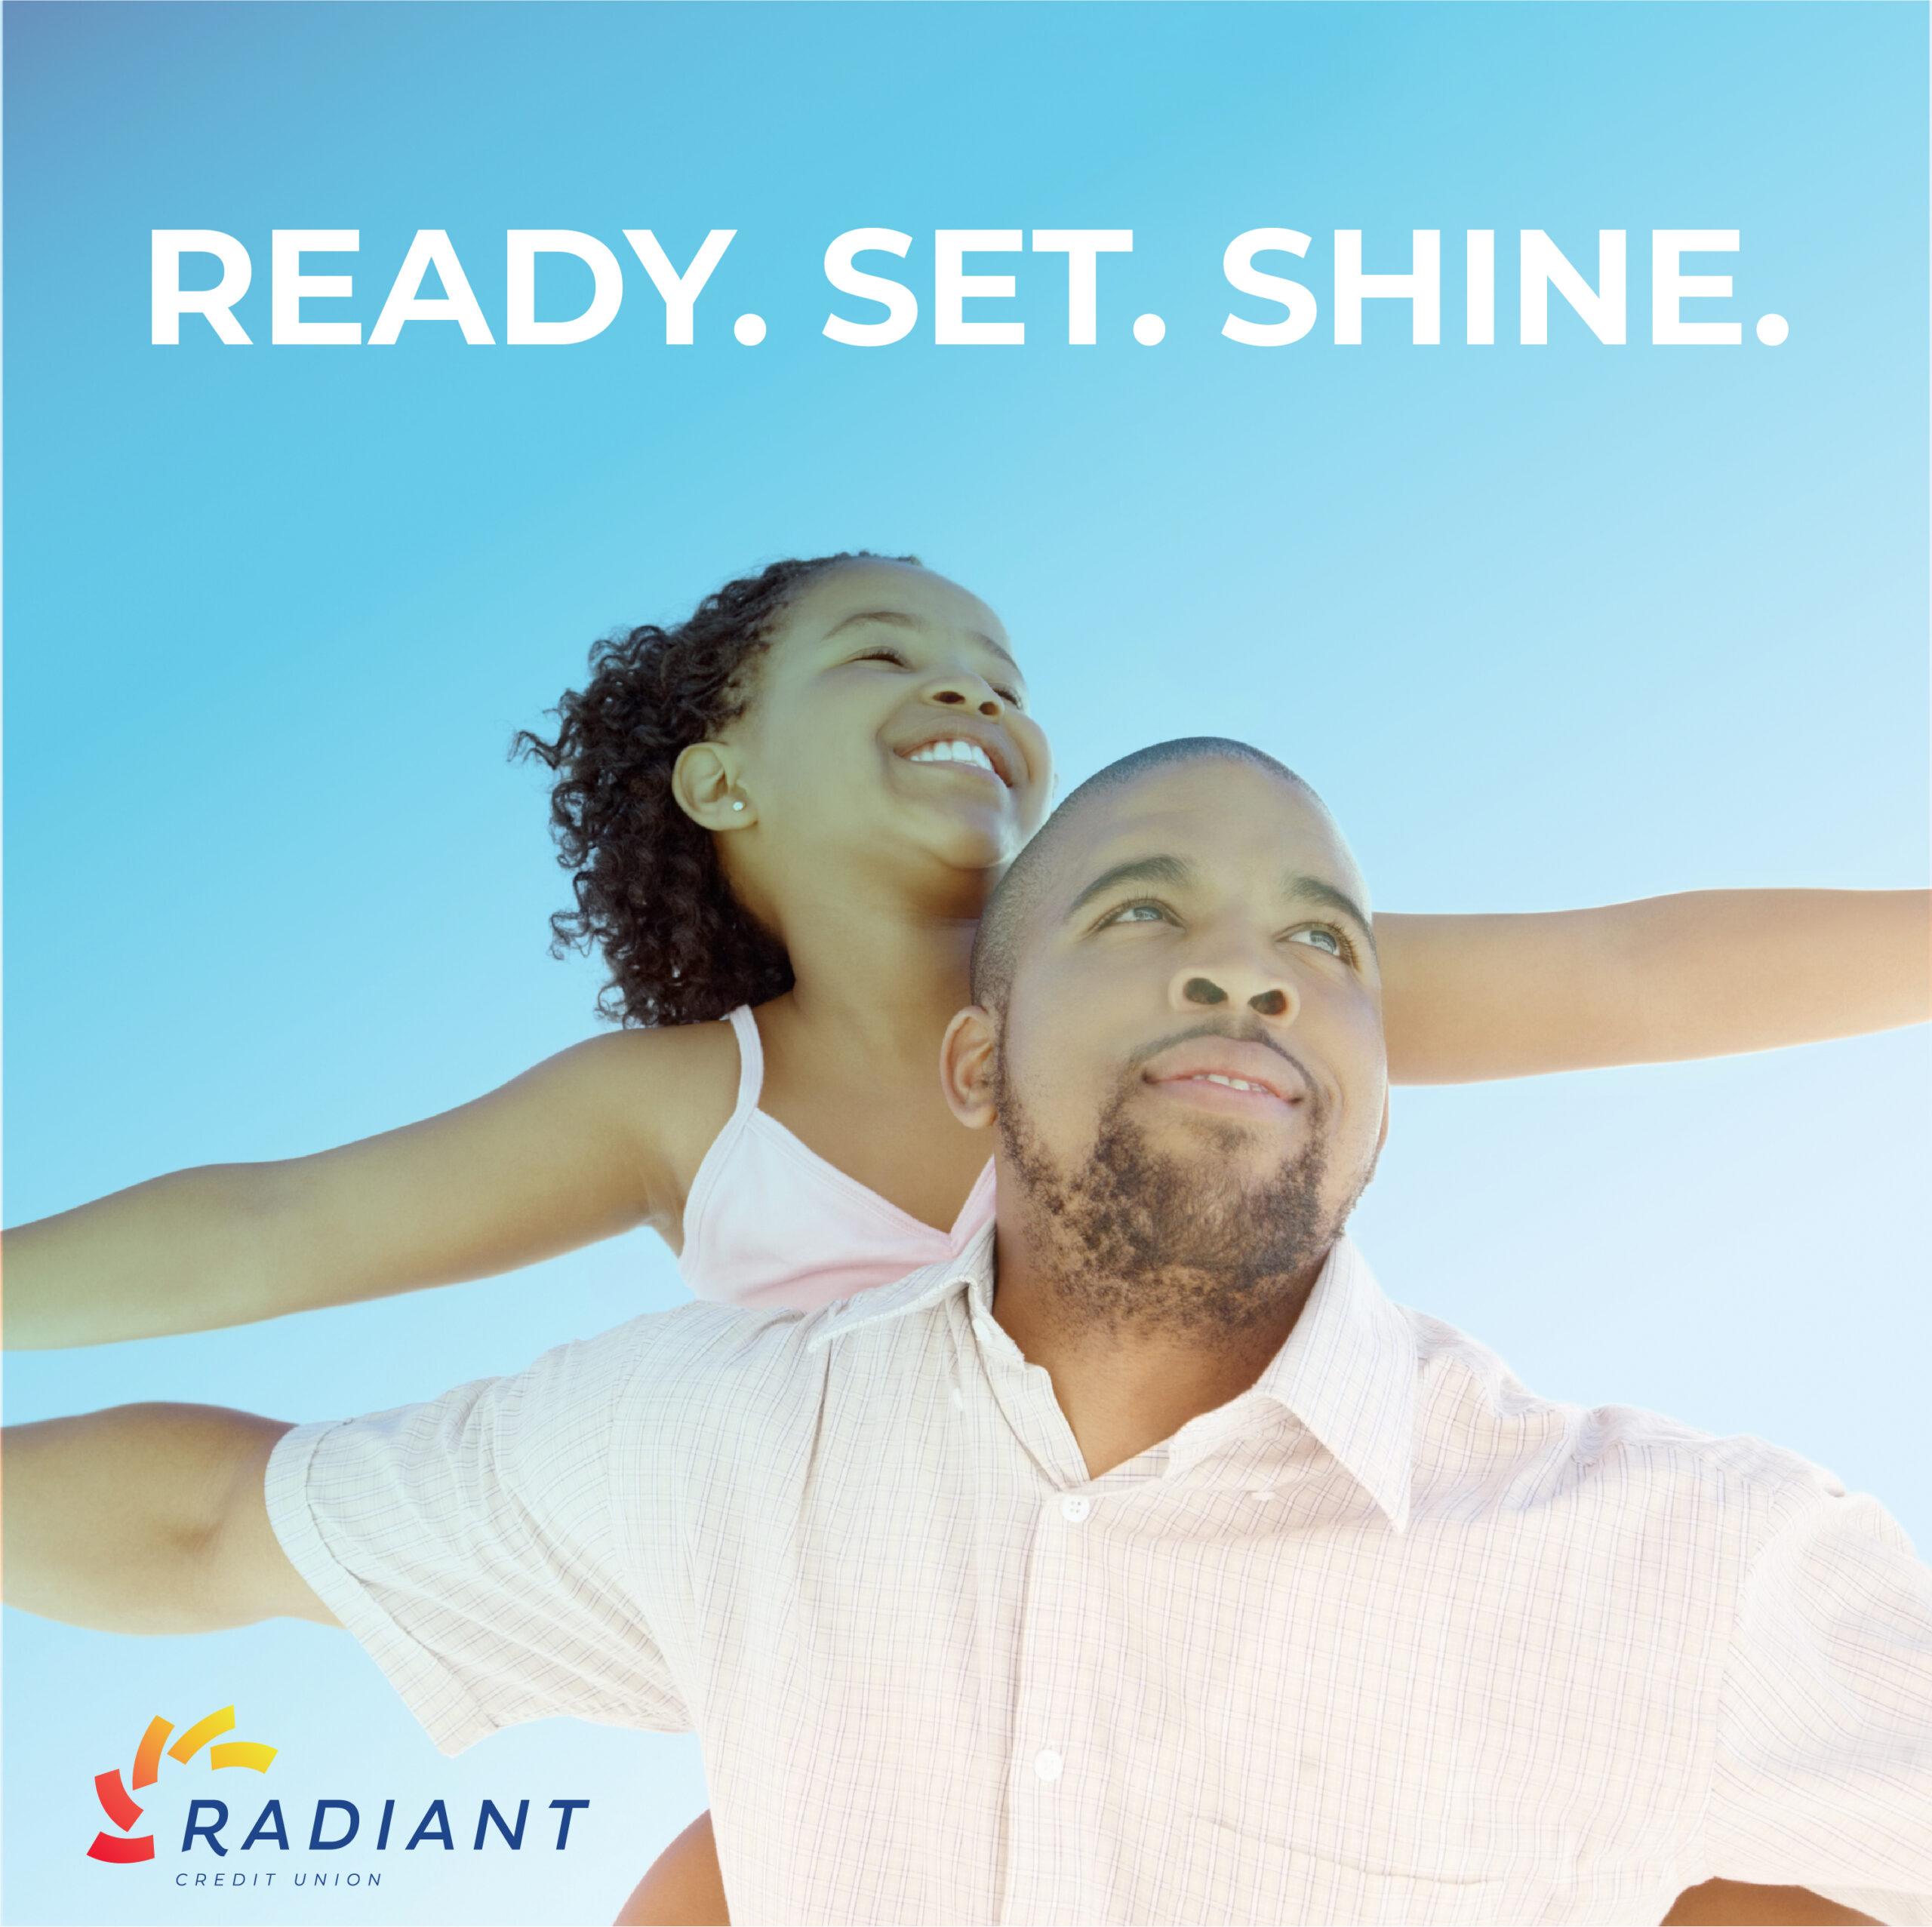 Radinat-Small-Image